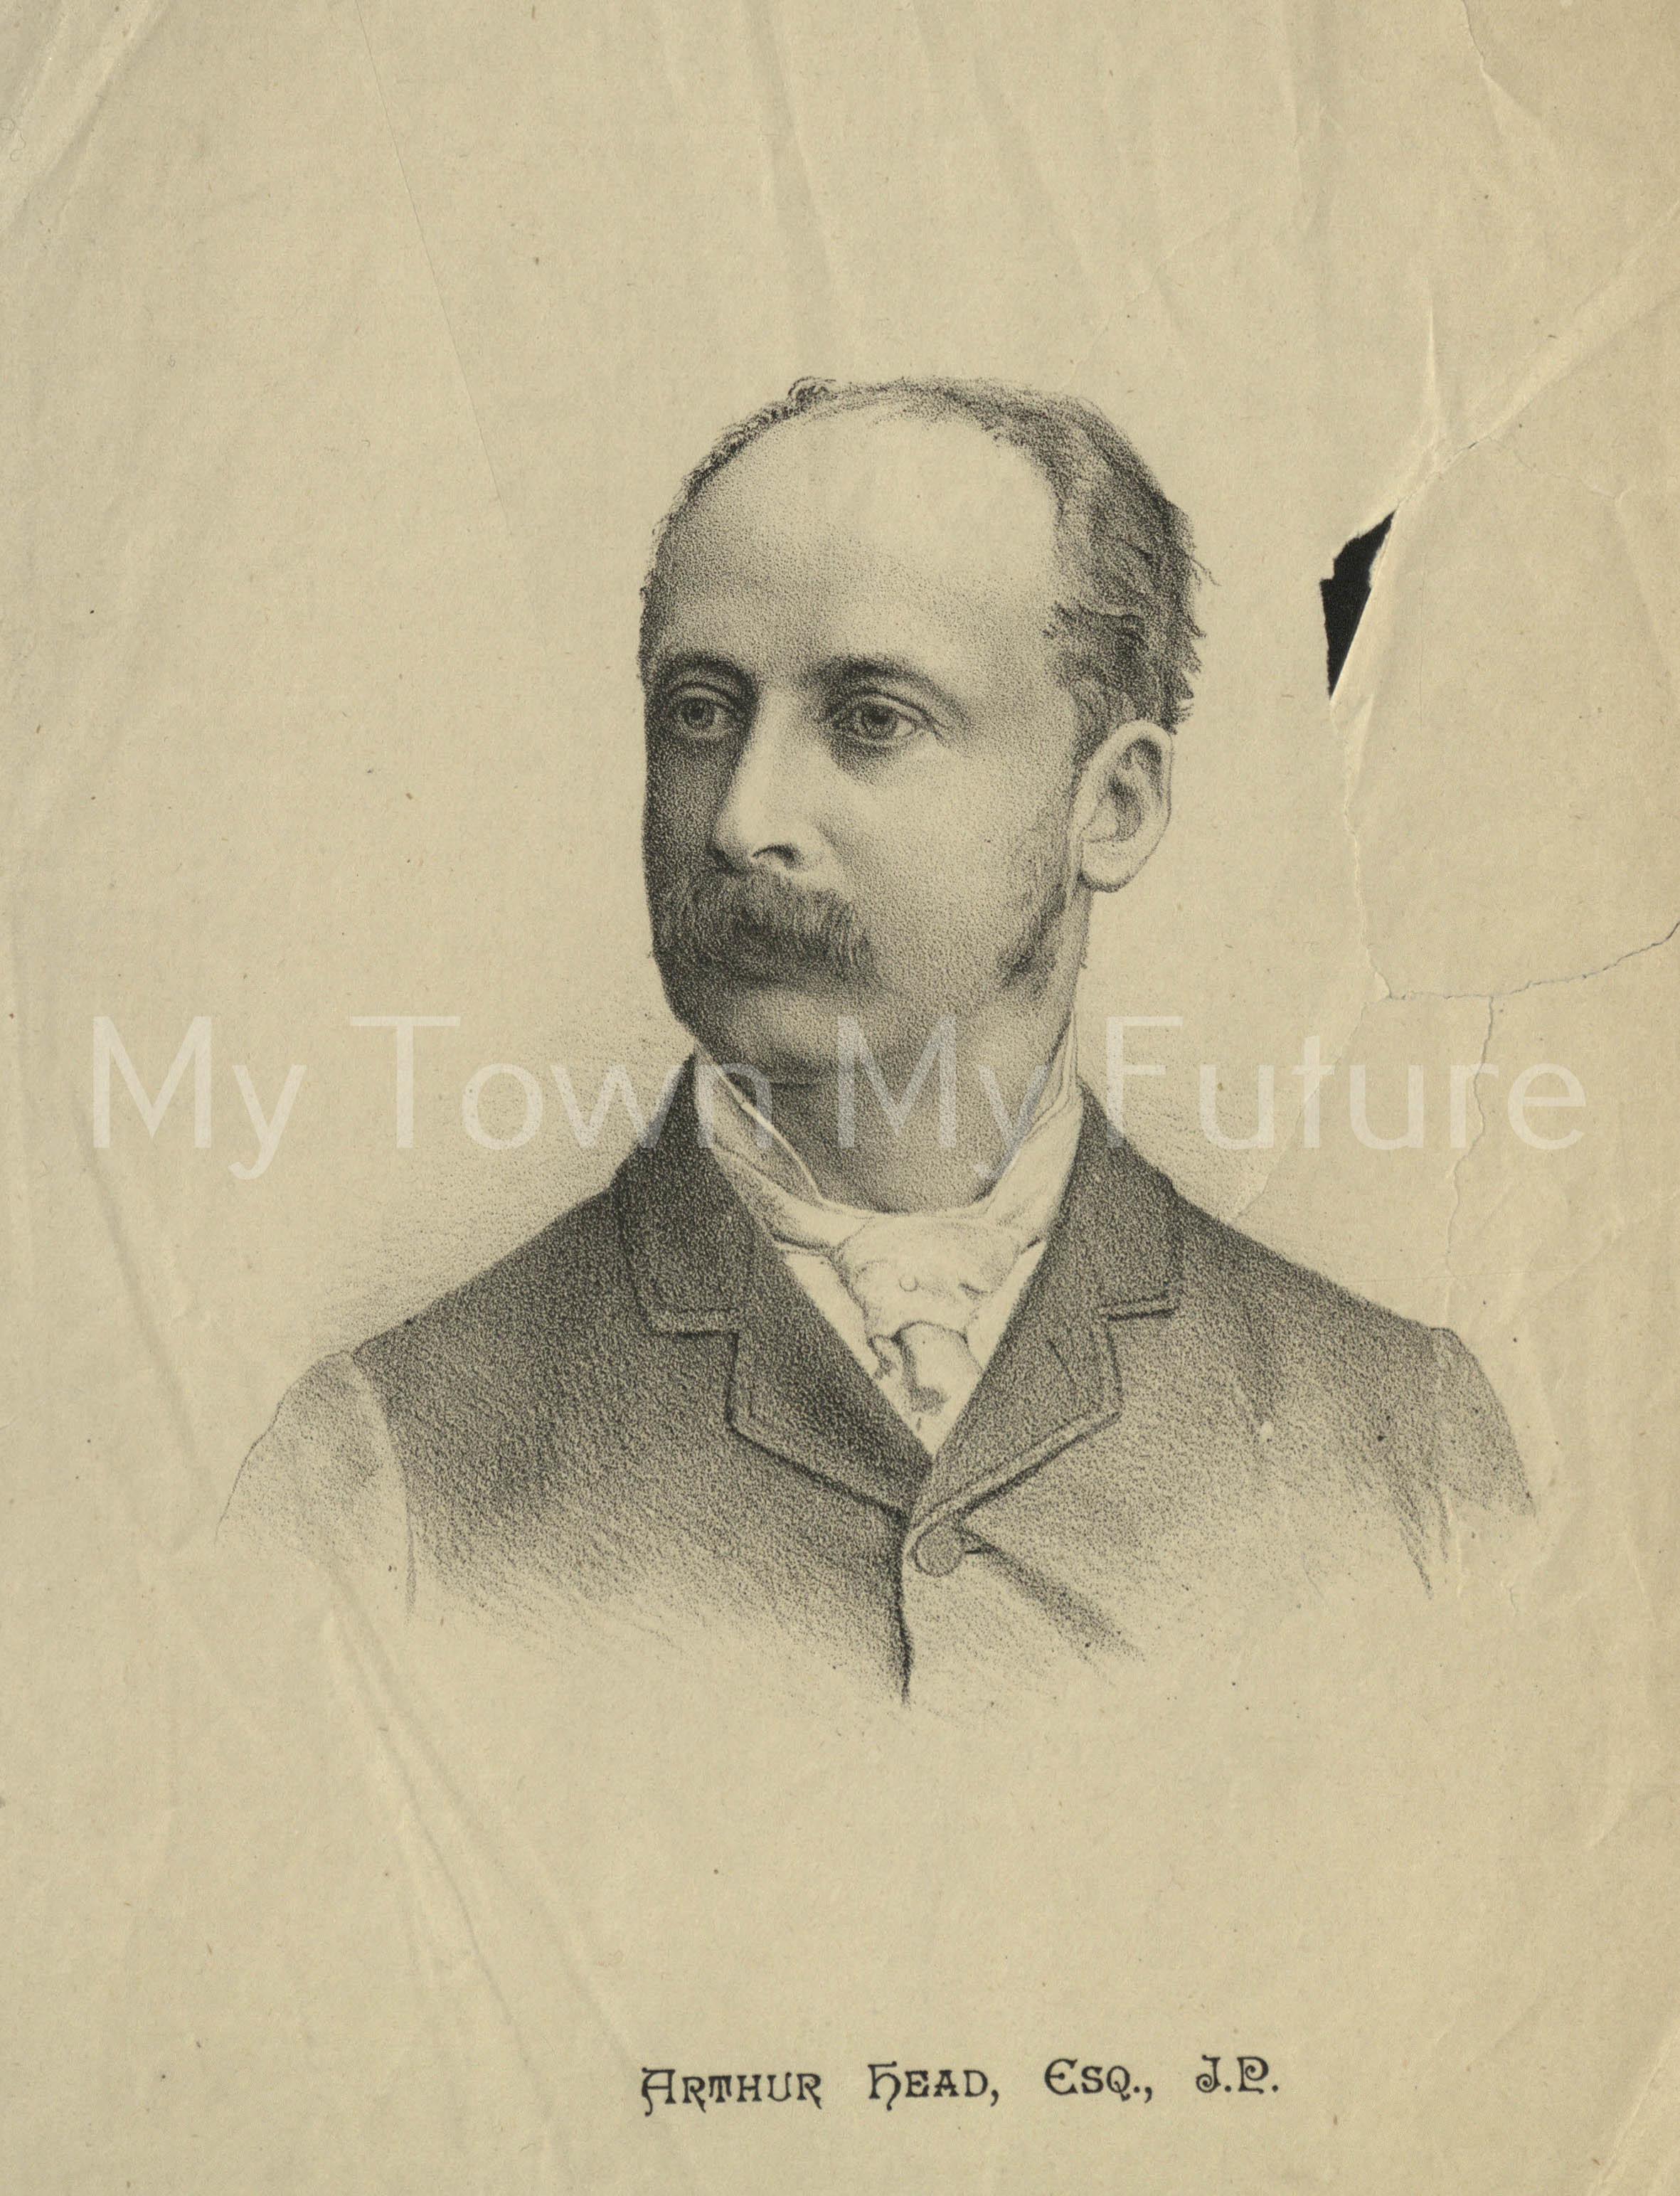 Arthur Head J.P